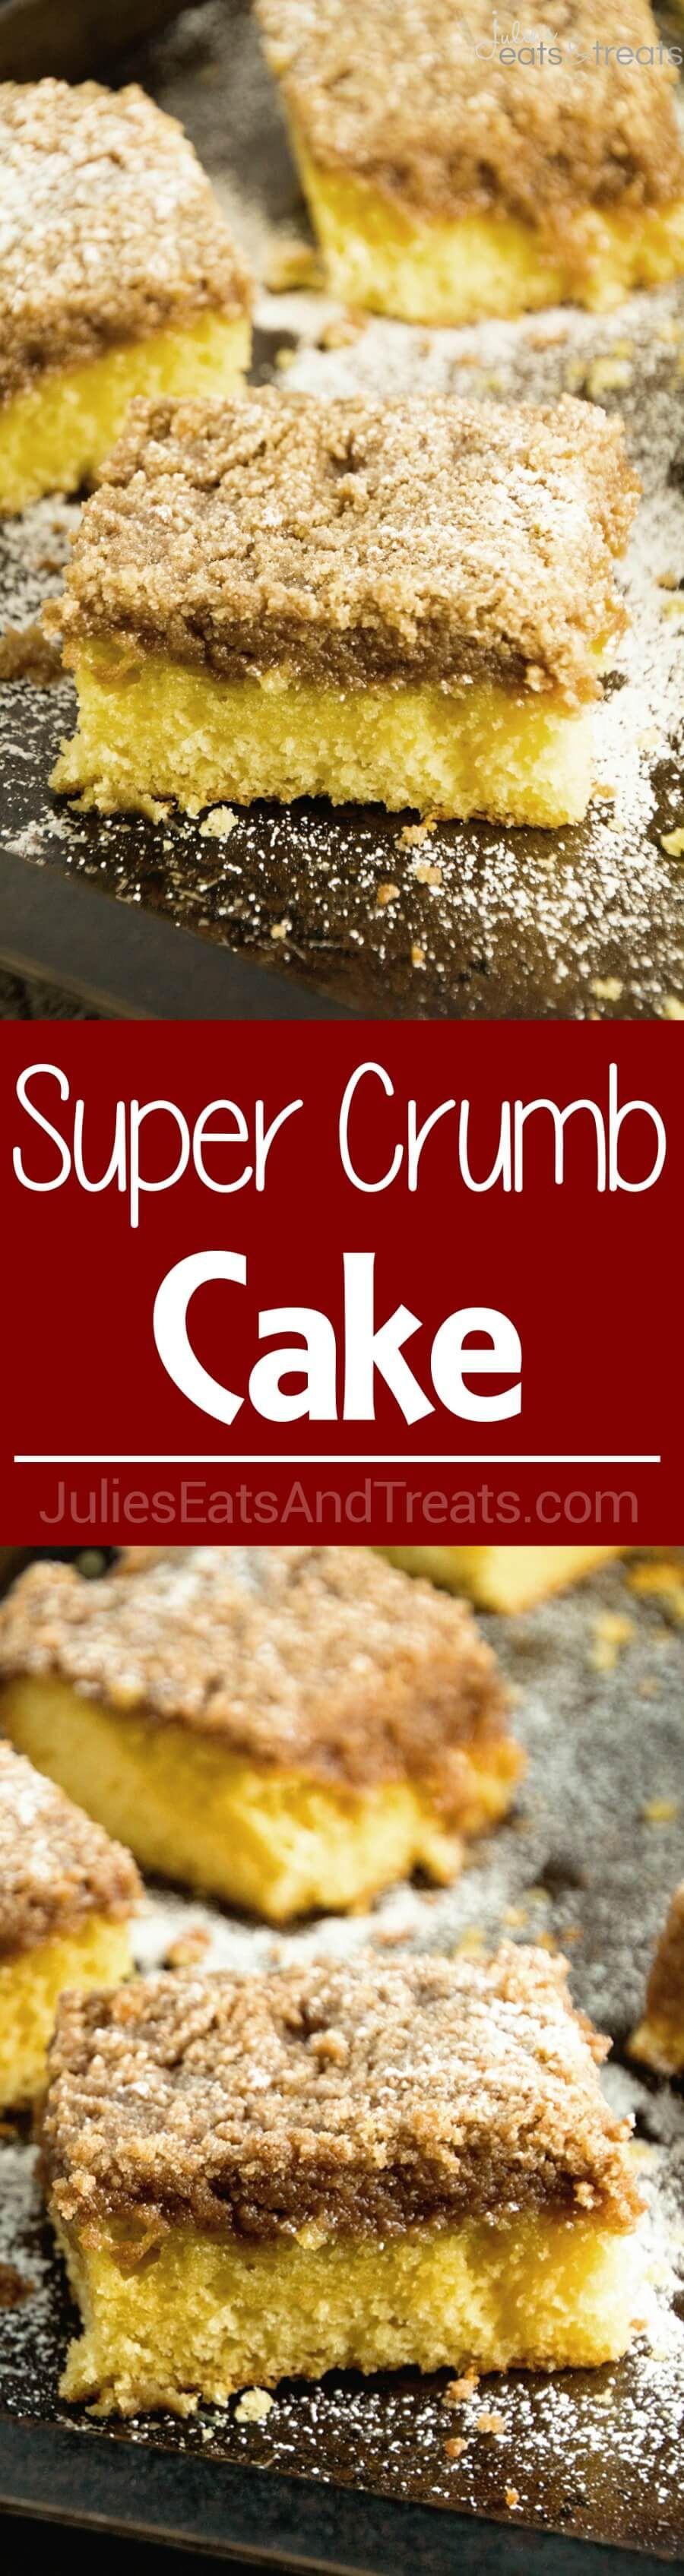 Super Crumb Cake This Delicious Coffee Cake Recipe